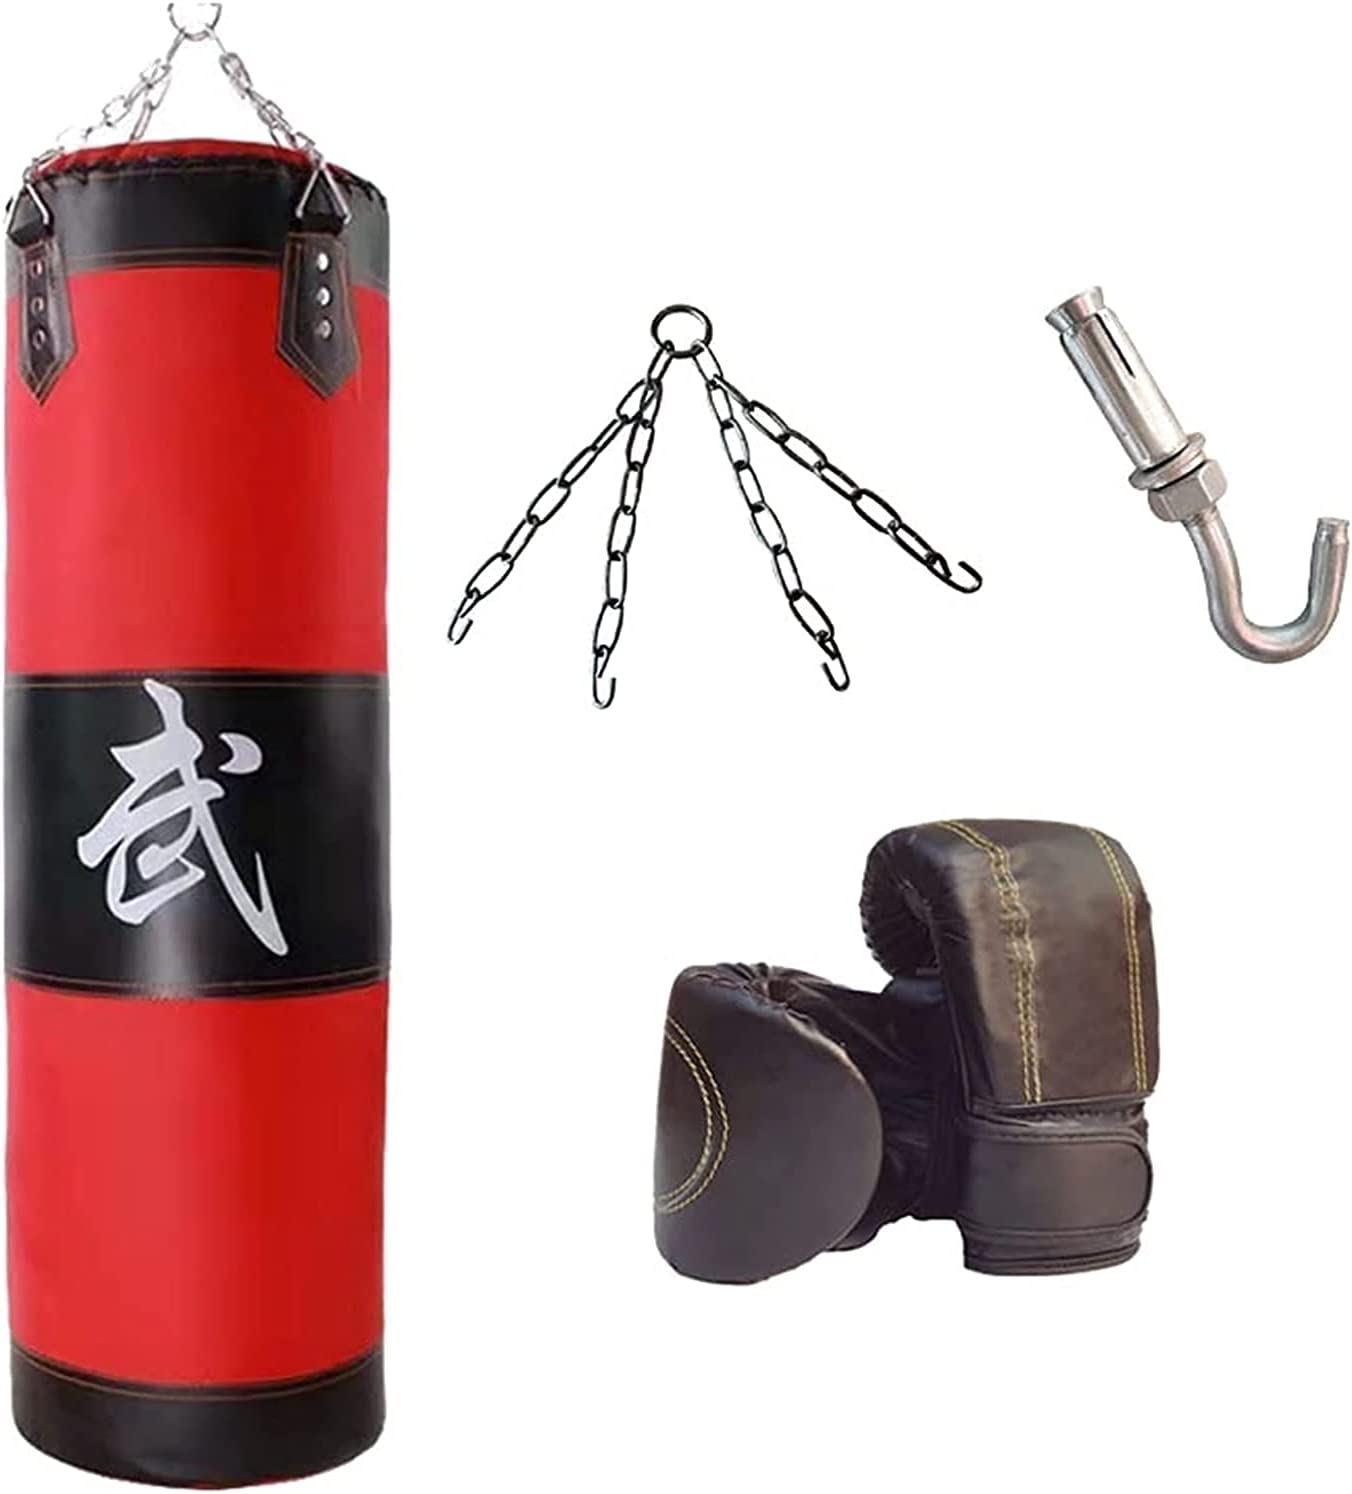 LSDRALOBBEB Punching Bag Boxing Heavy Punch Credence Bags Thi Sandbag Detroit Mall